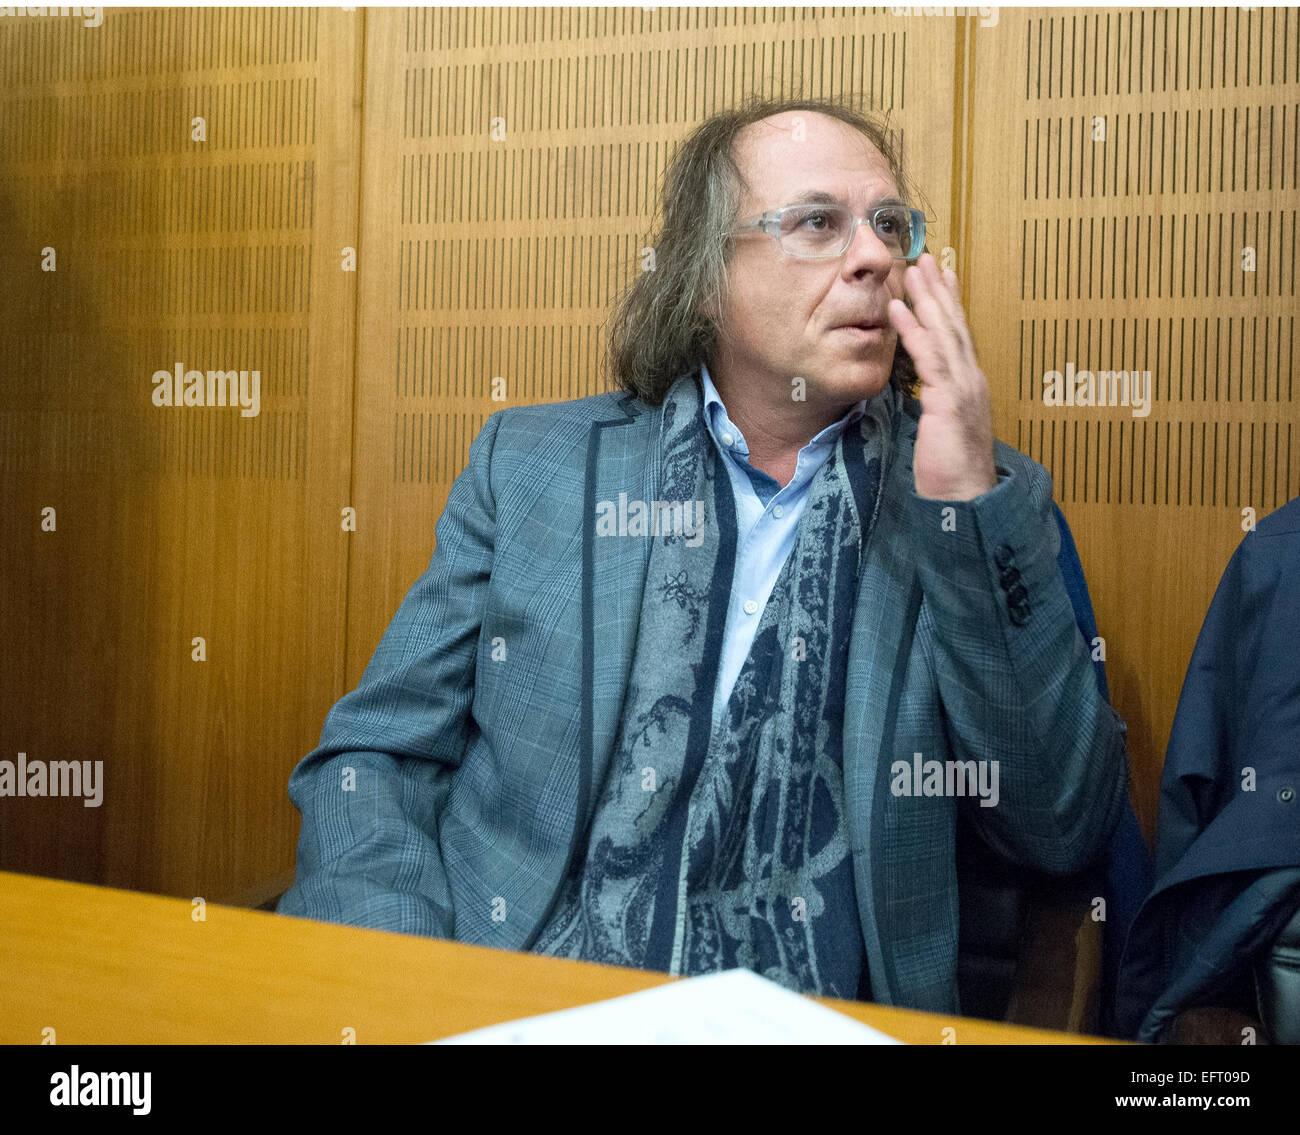 Frankfurt, Germany. 10th Feb, 2015. Real estate entrepreneur Ardi Goldmann sits in the dock at the Regional Court - Stock Image